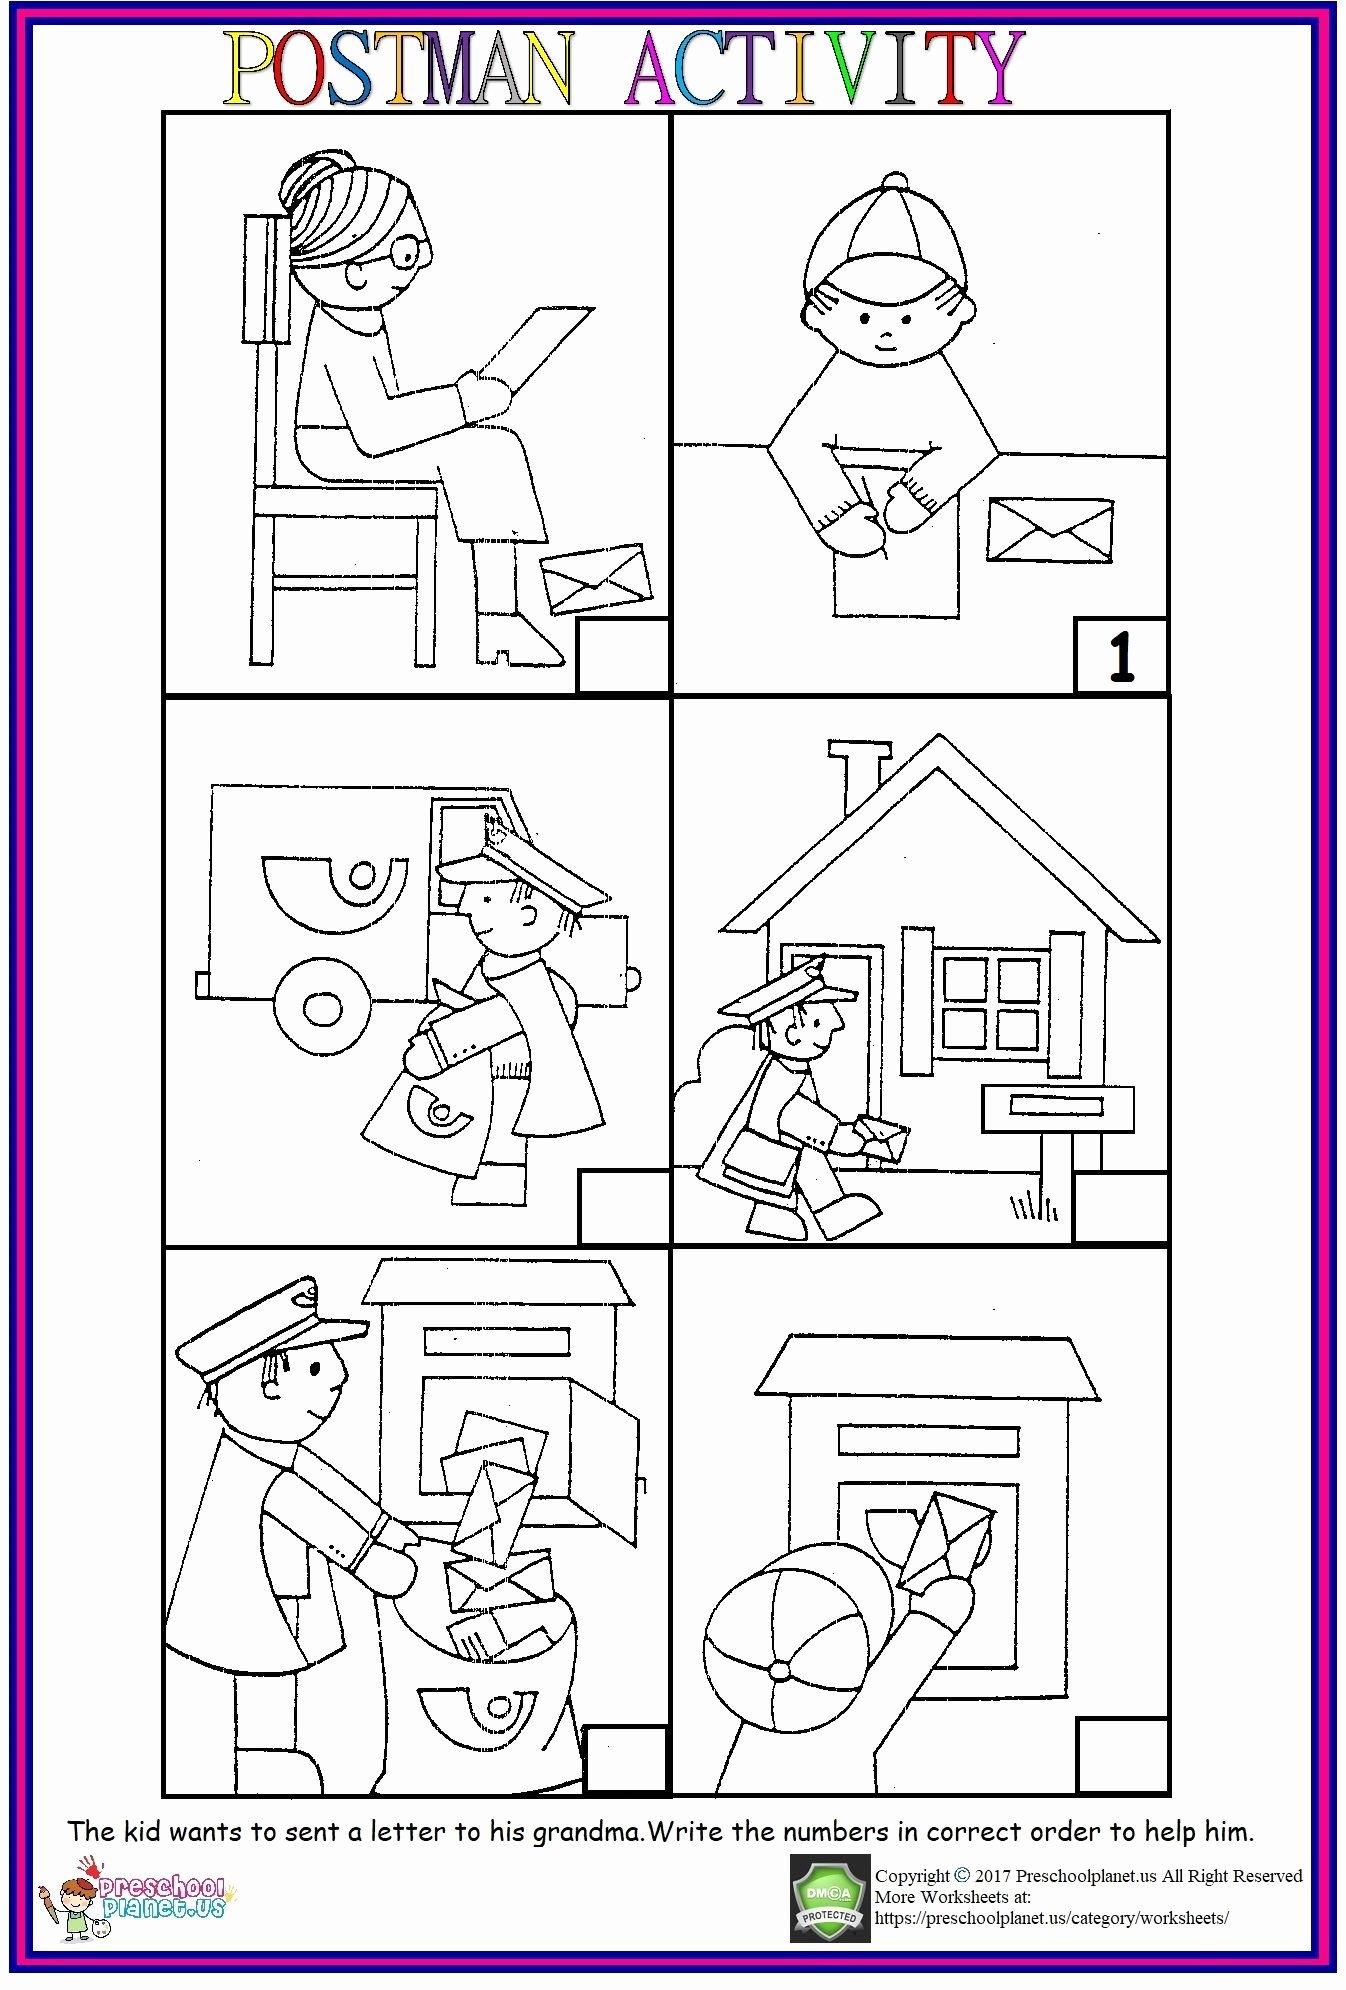 Post Office Worksheets For Preschoolers